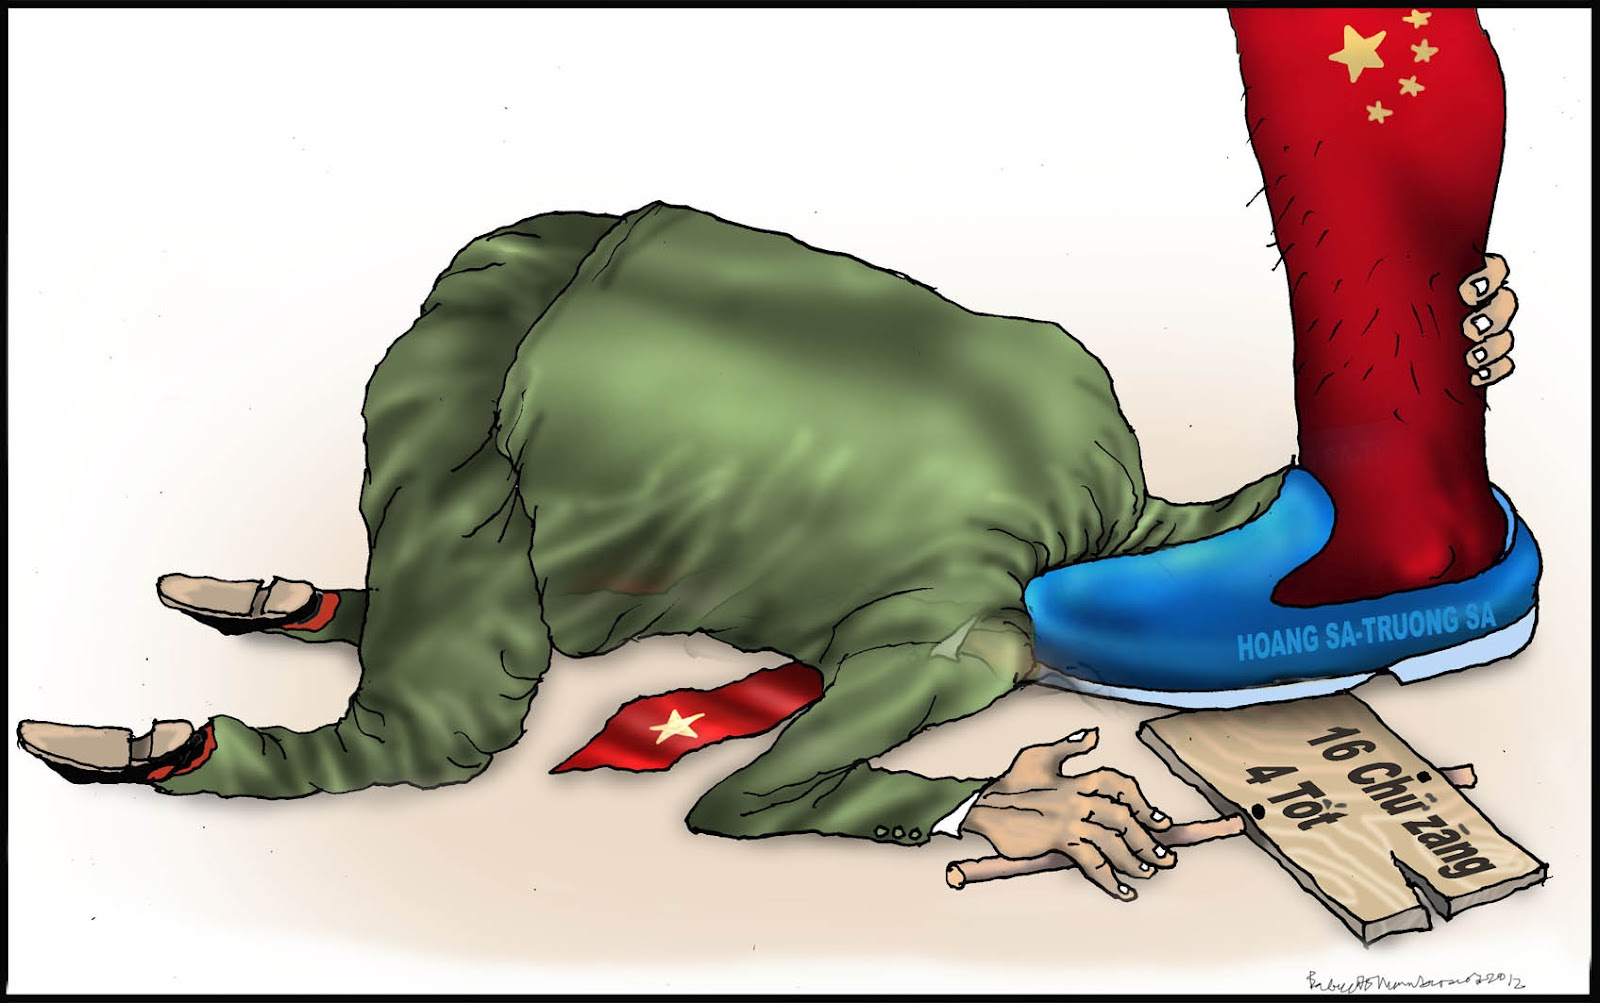 Bildergebnis für tranh biếm họa về đảng cộng sản